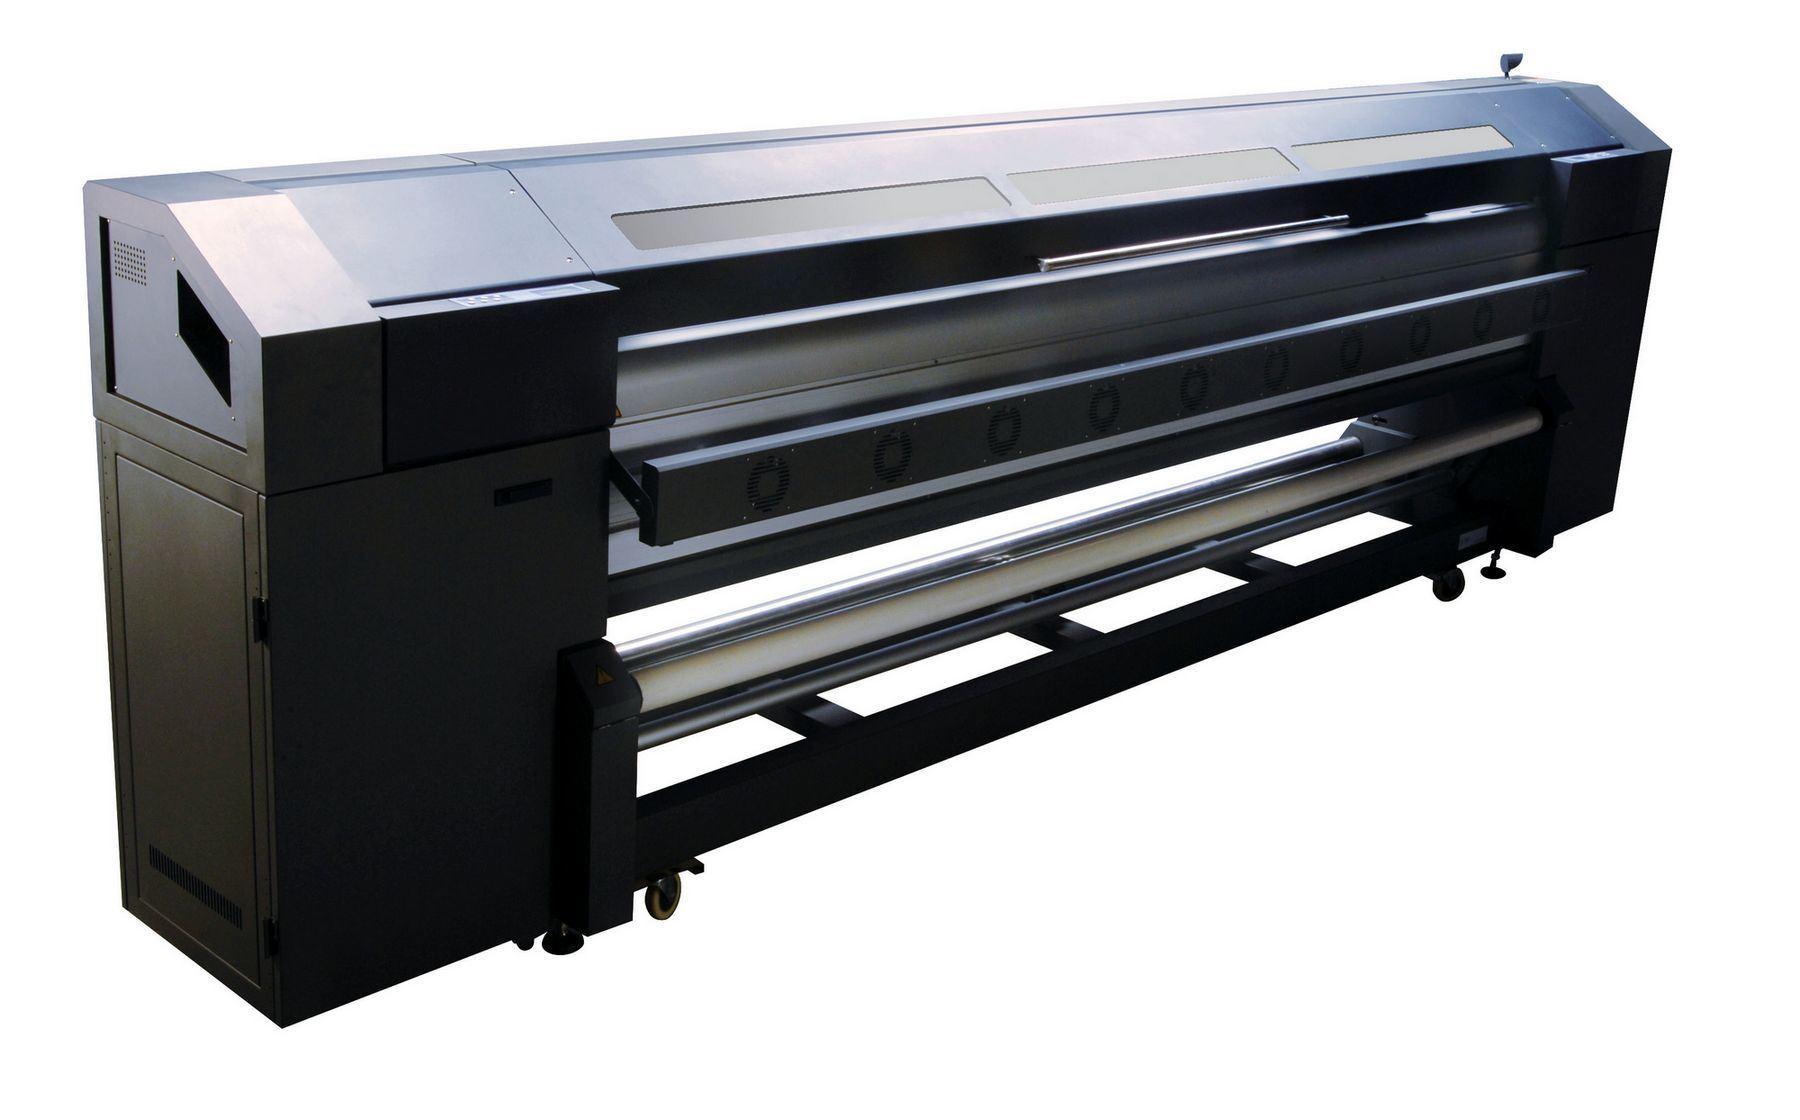 Large Format Printer   Bed Mattress Sale